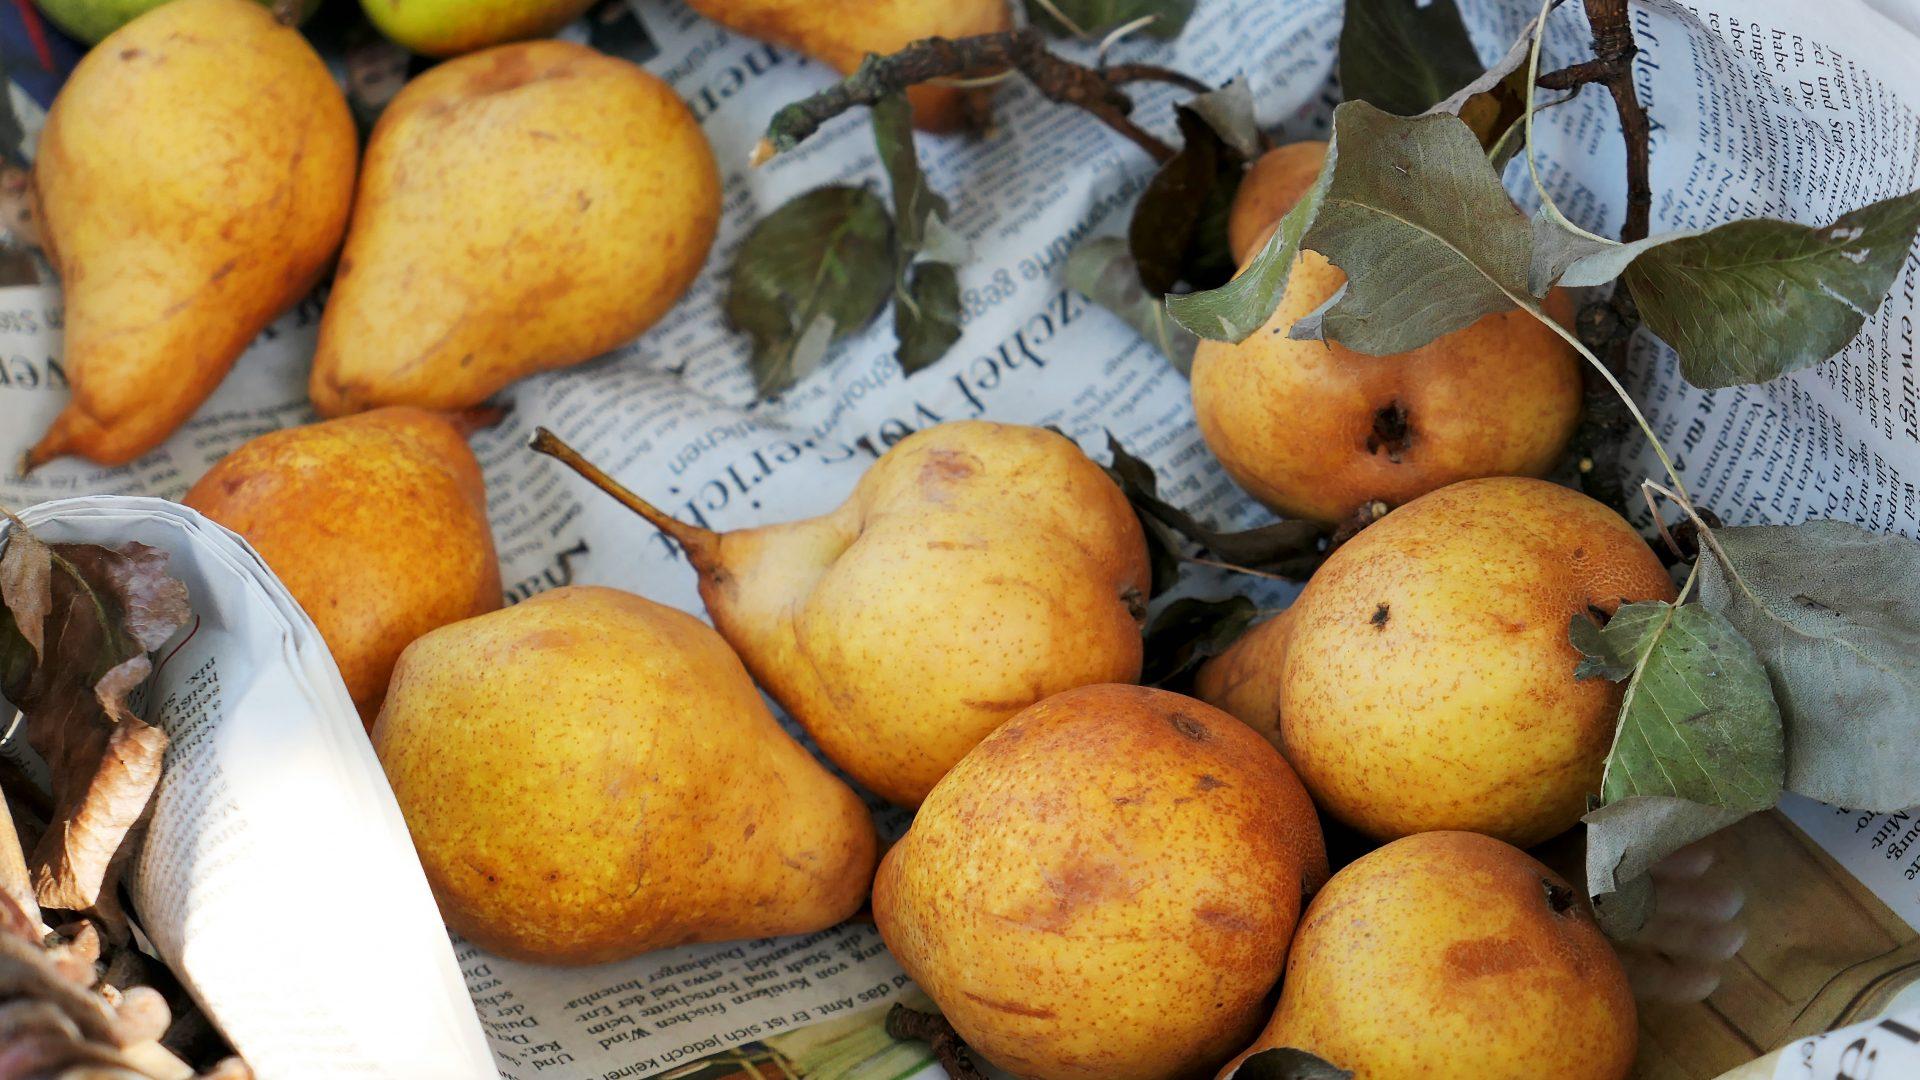 pears-3697536